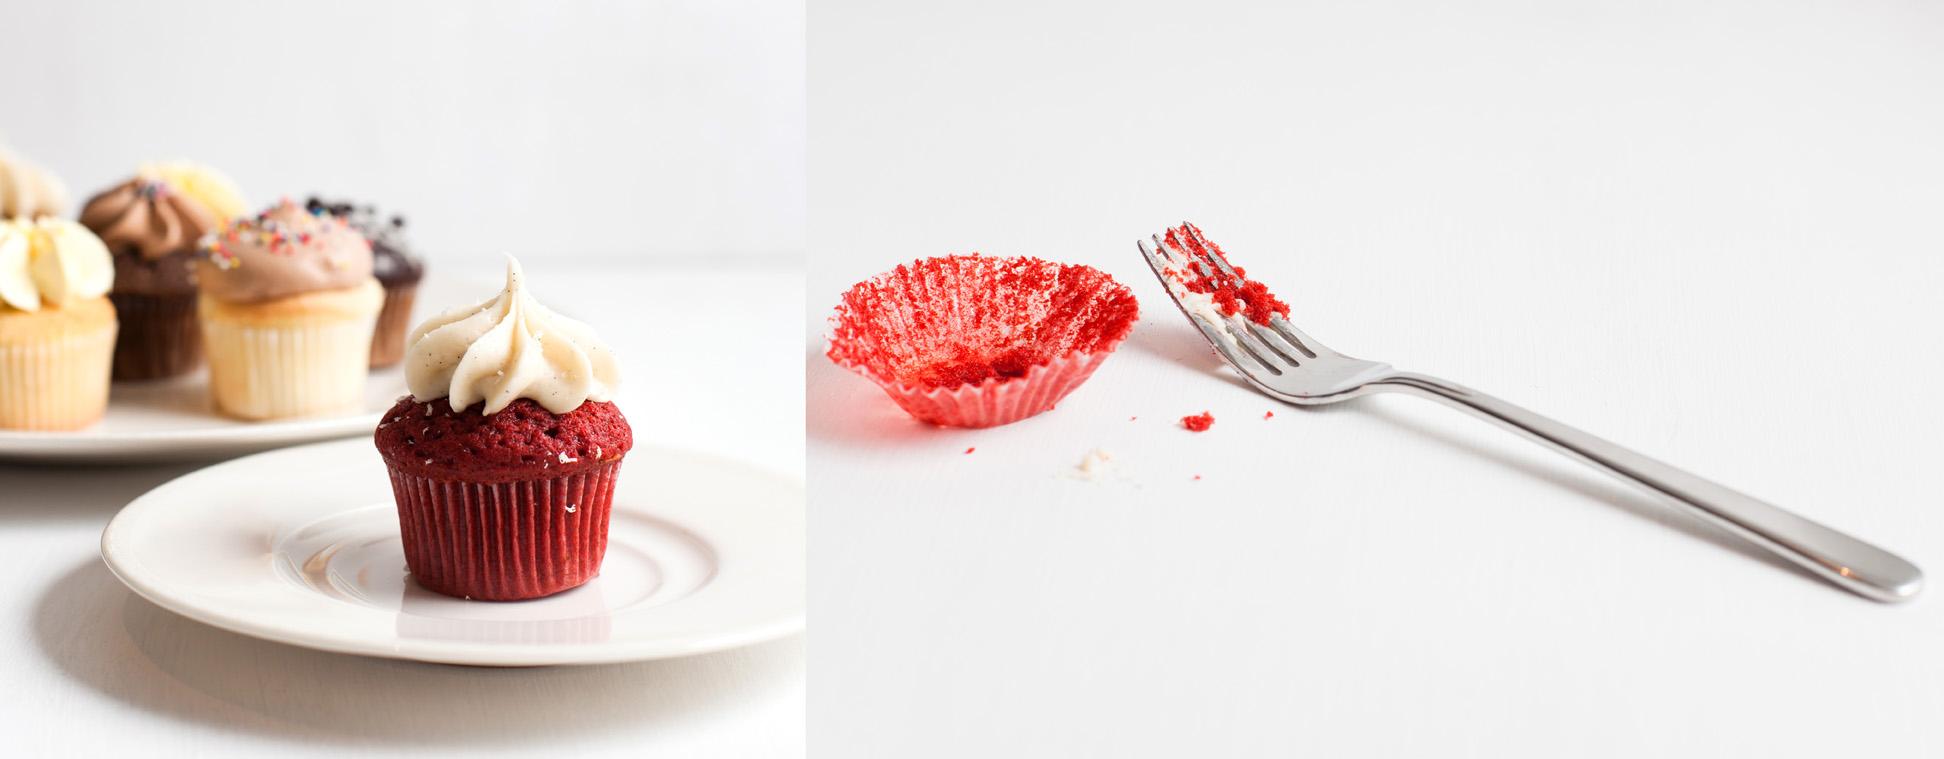 Mini Cupcakes 6s.jpg